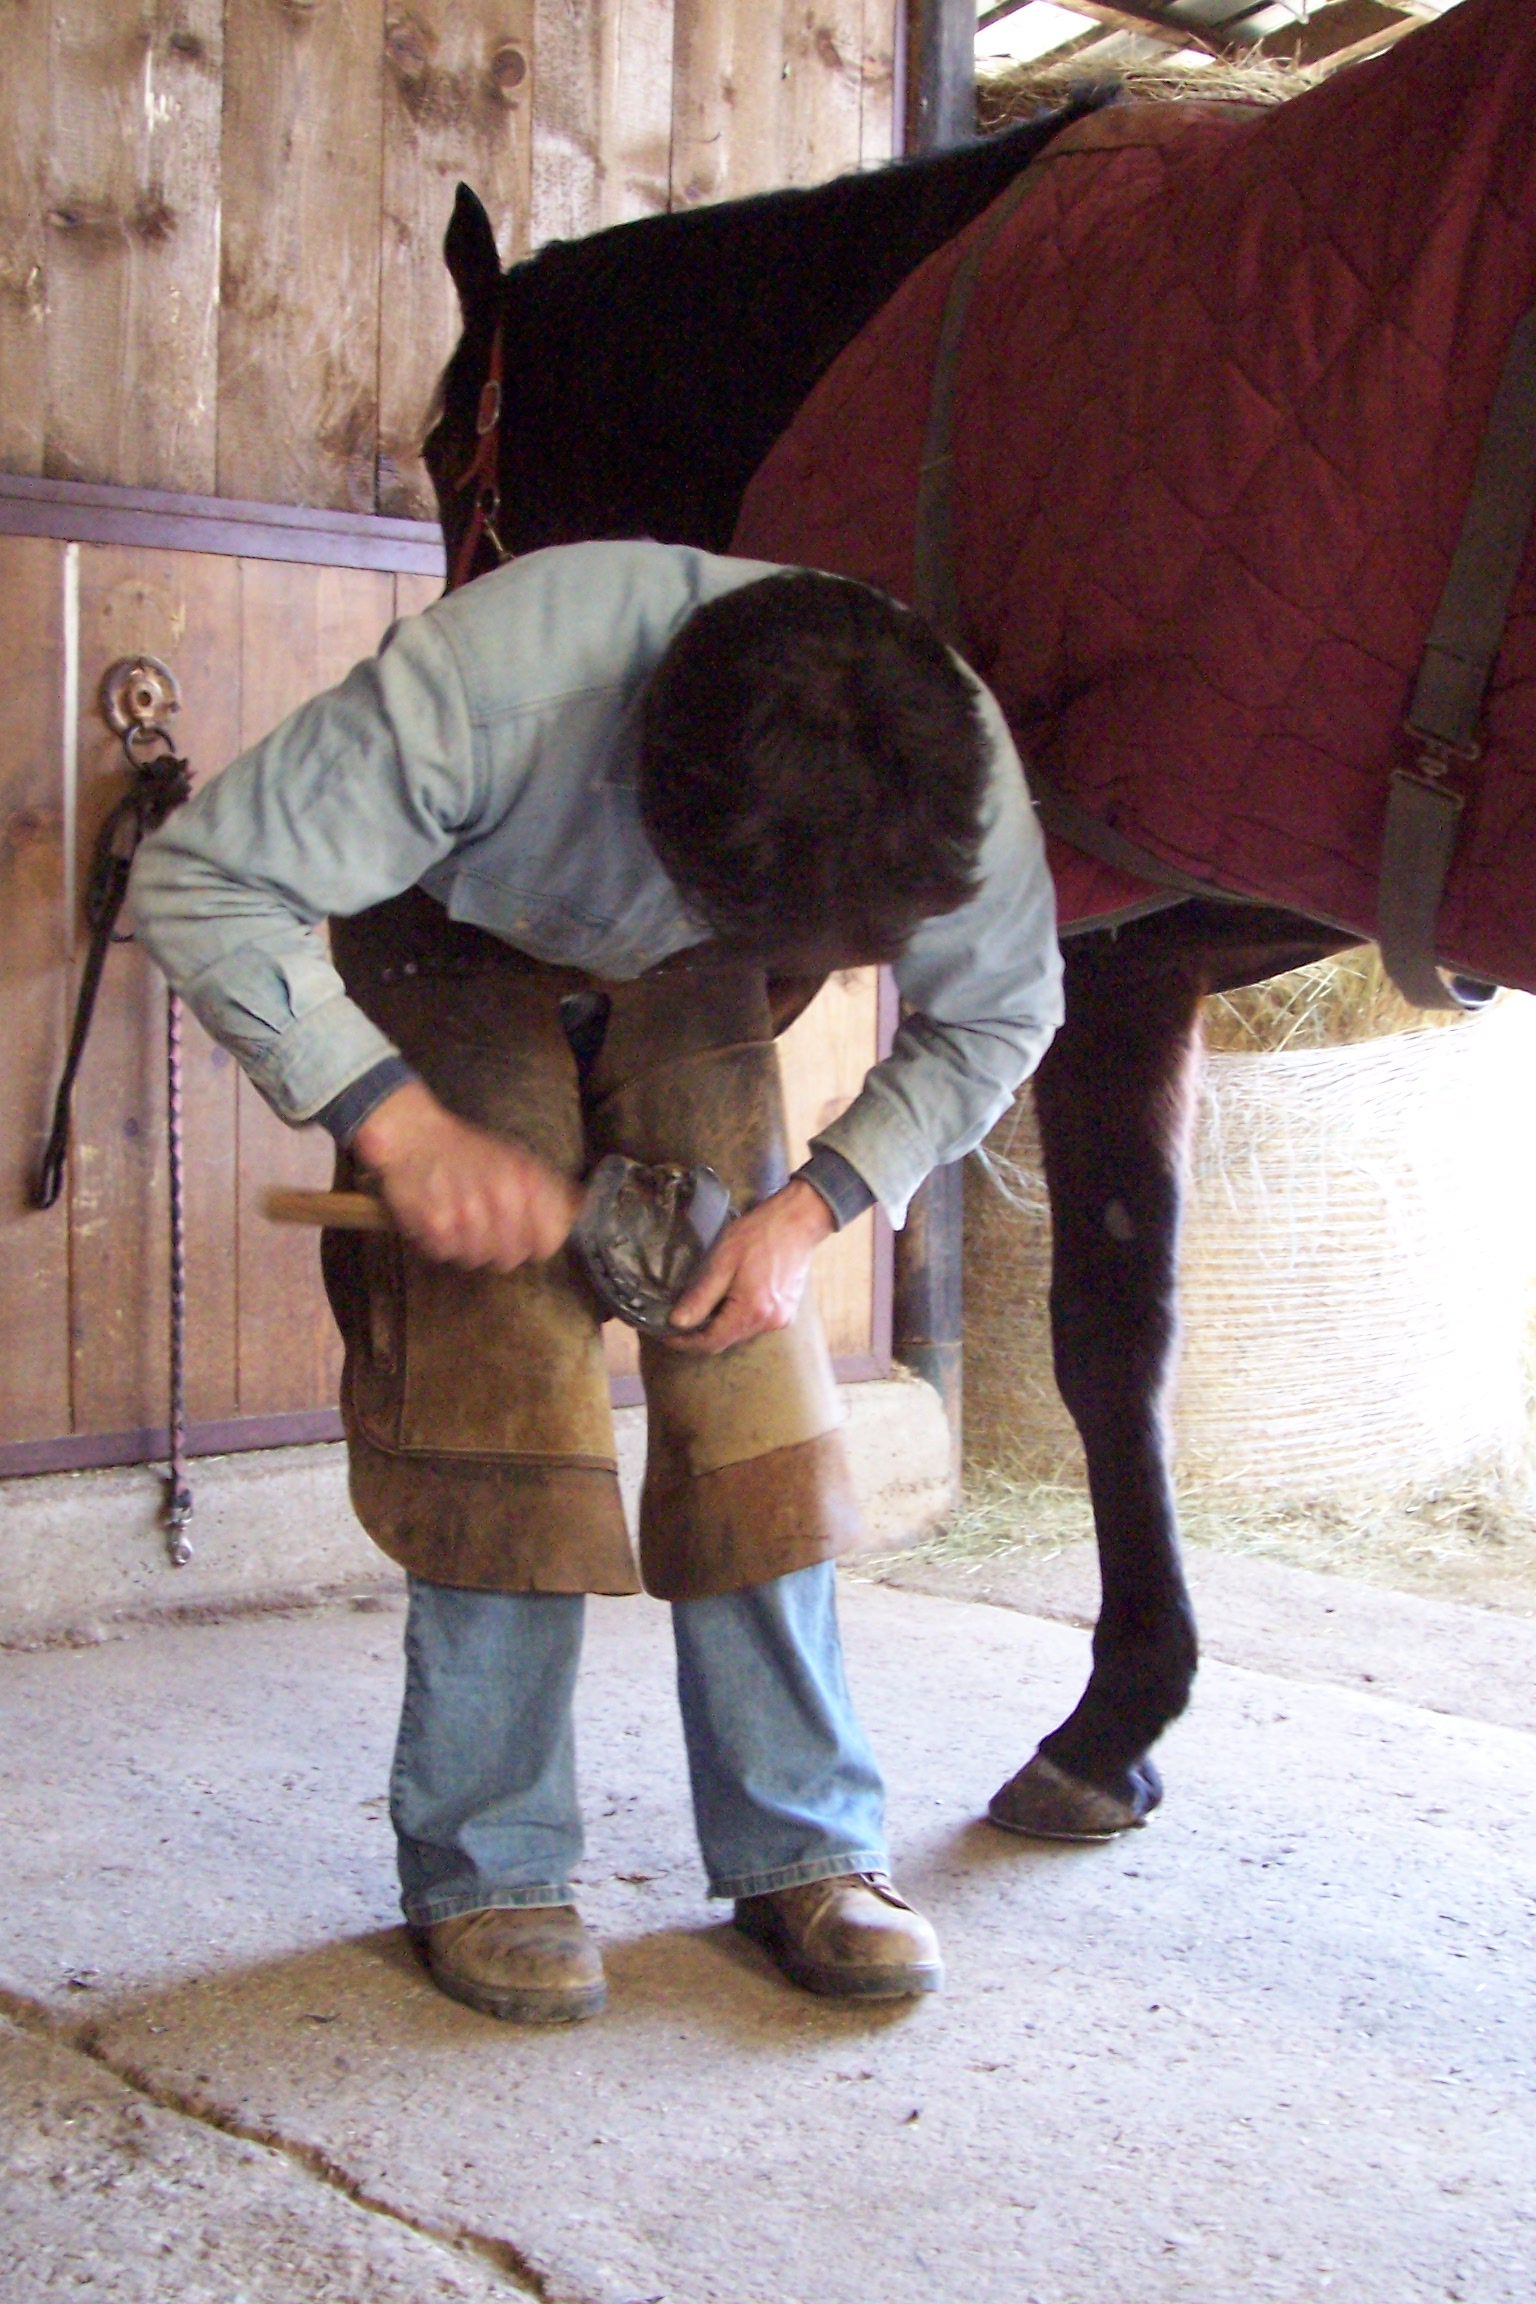 Source: https://en.wikipedia.org/wiki/Horse_care#/media/File:Italian_farrier_2006_1.jpg